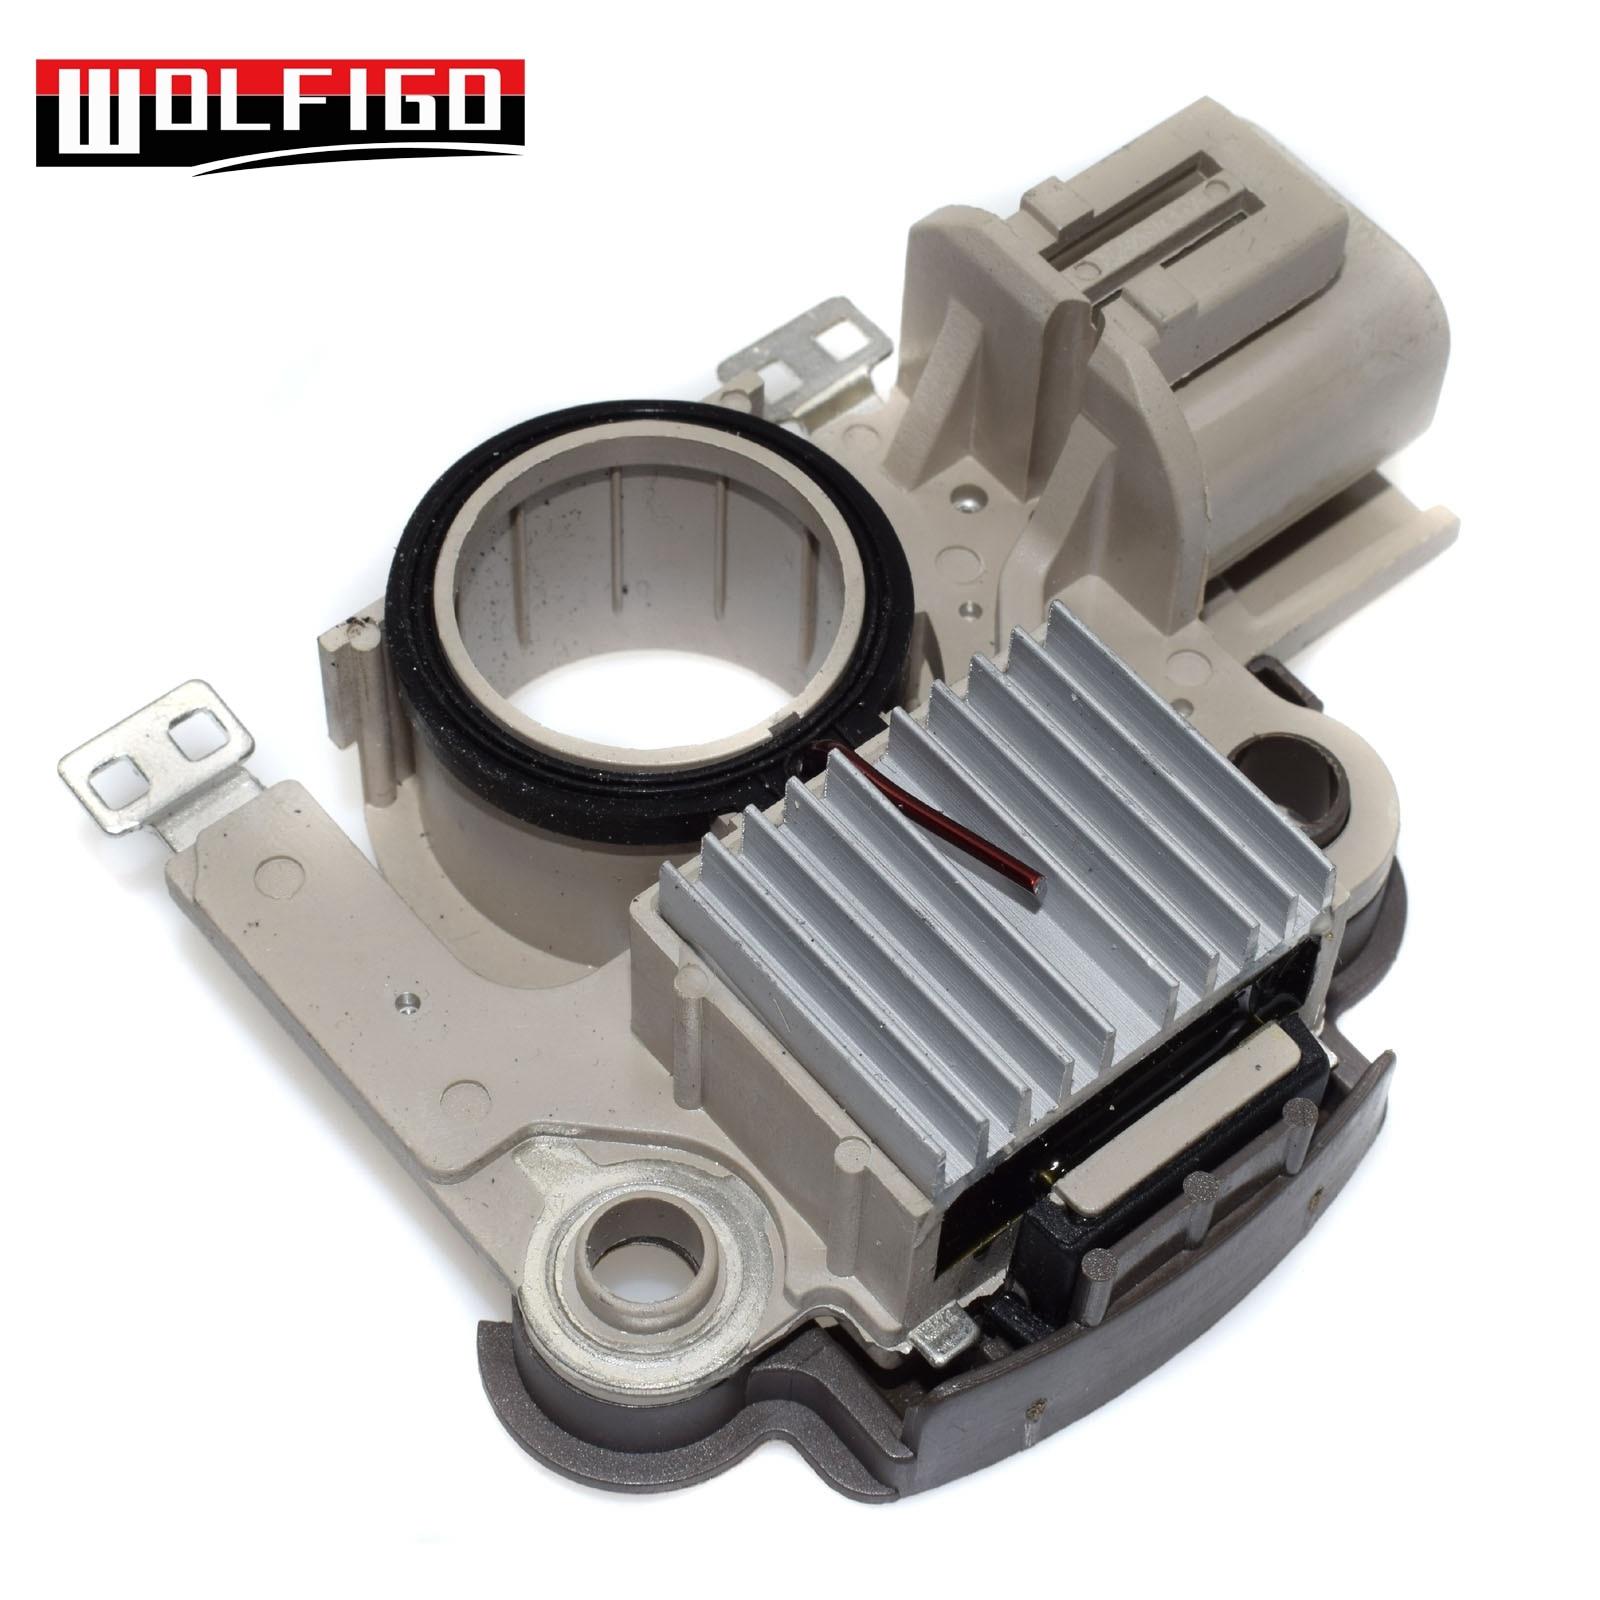 WOLFIGO New Alternator Voltage Regulator Fit For MAZDA 323 626 Miata MX-6 RX-7 Protege B61P-18-300,A2T17574,A2T19991,A866X20472